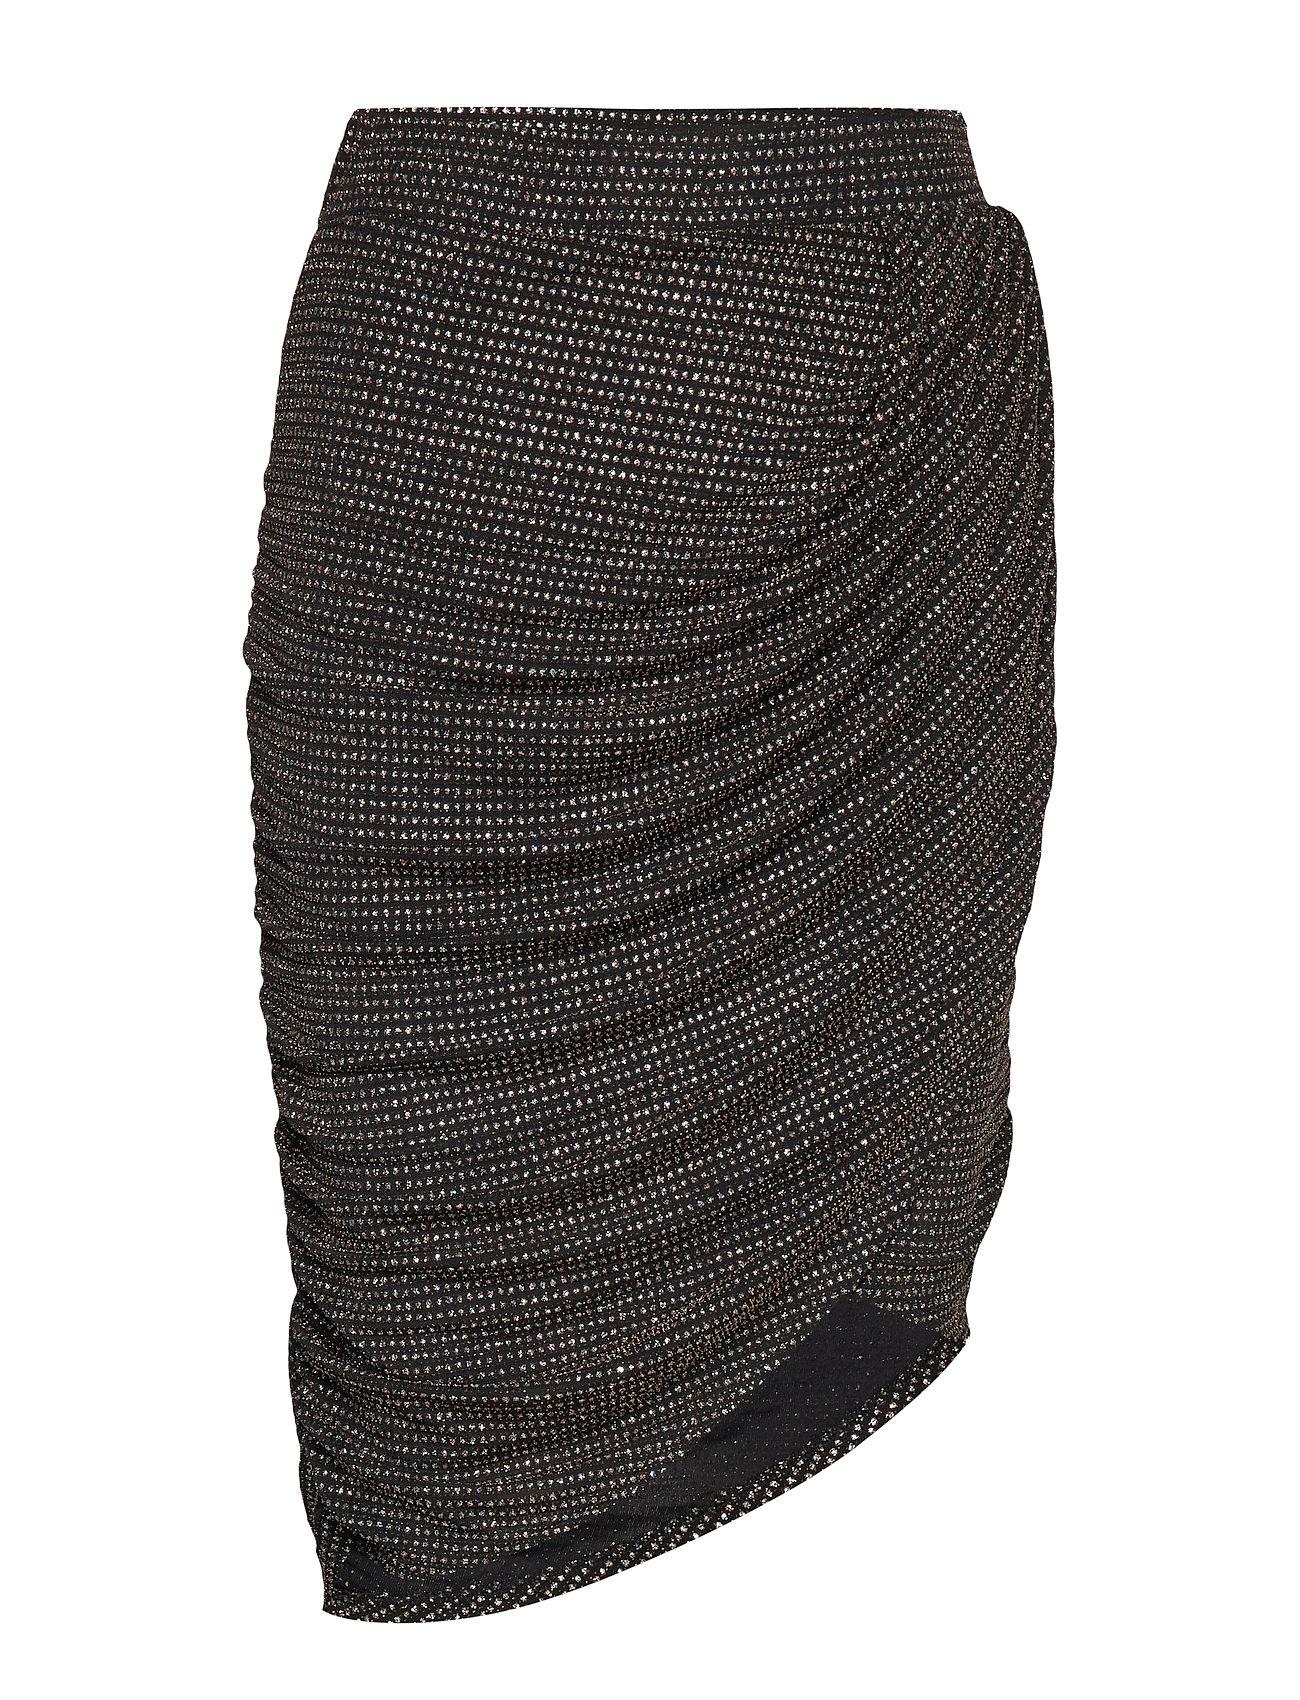 Ravn RAVN * BOOZT Glimmer skirt Exclusive - 001 BLACK